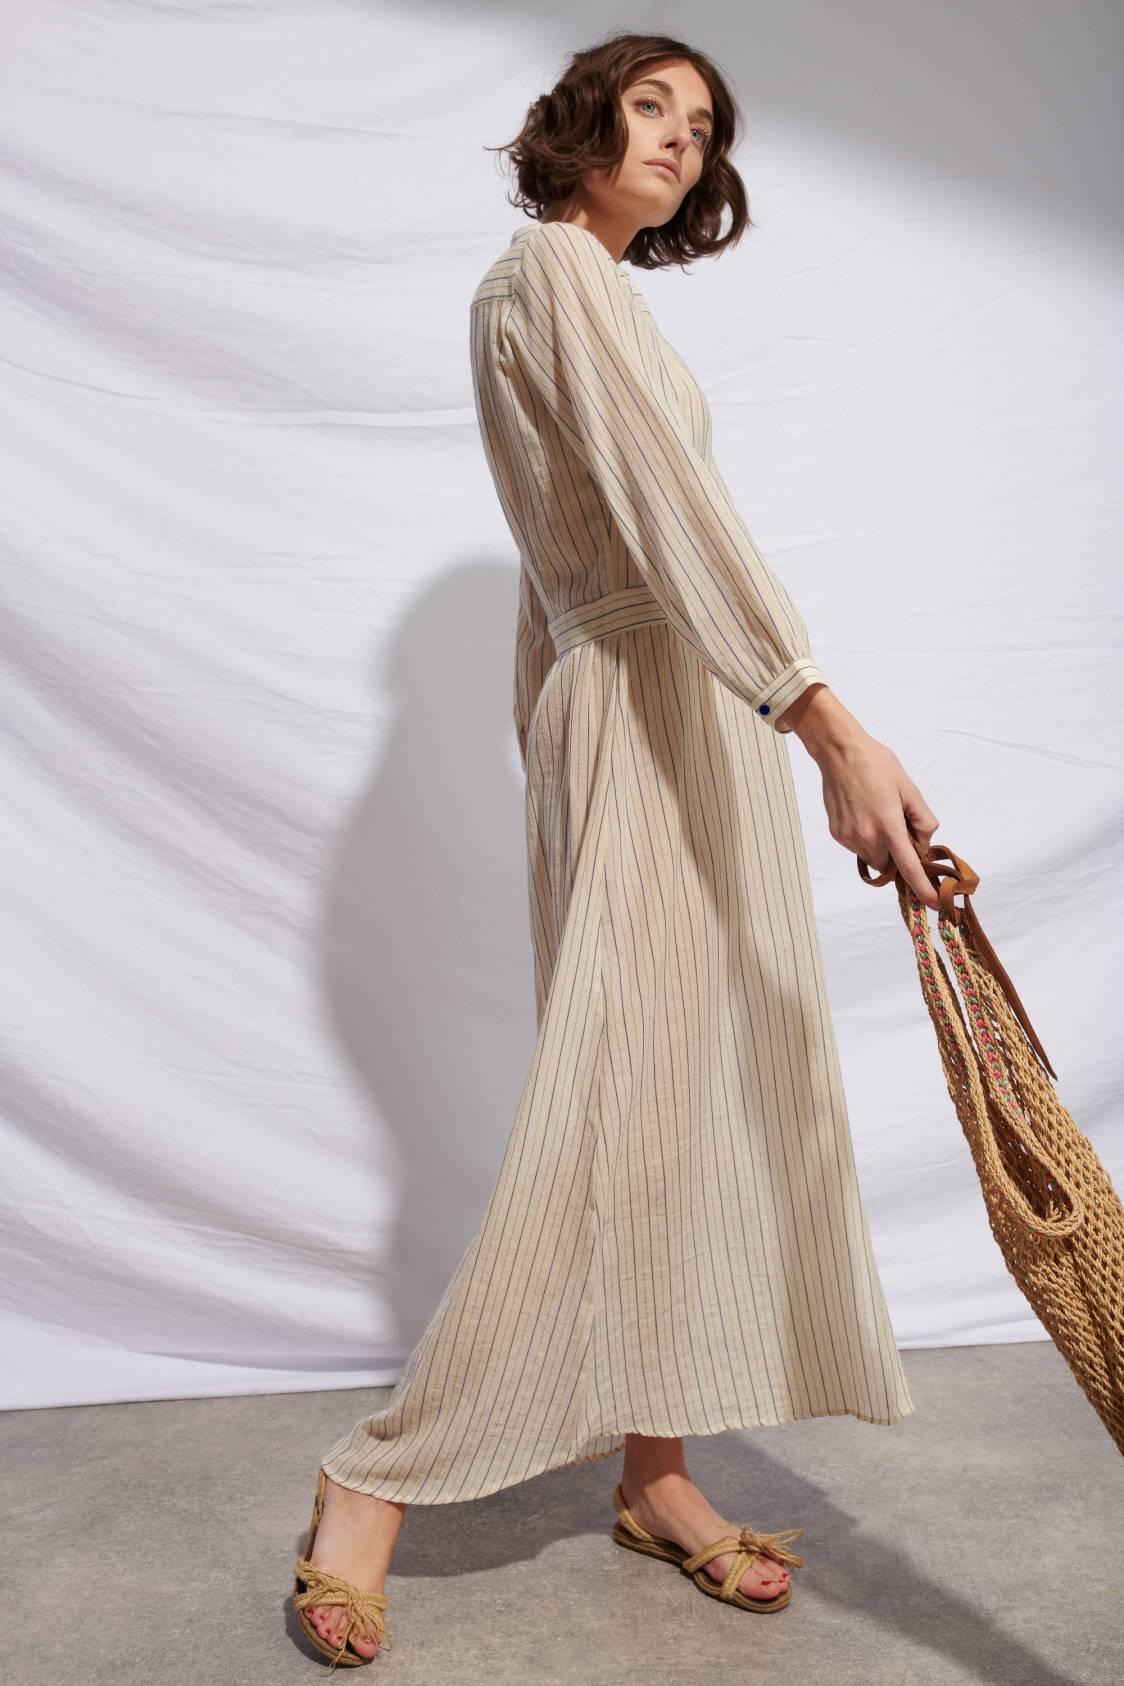 Robe en coton rayé